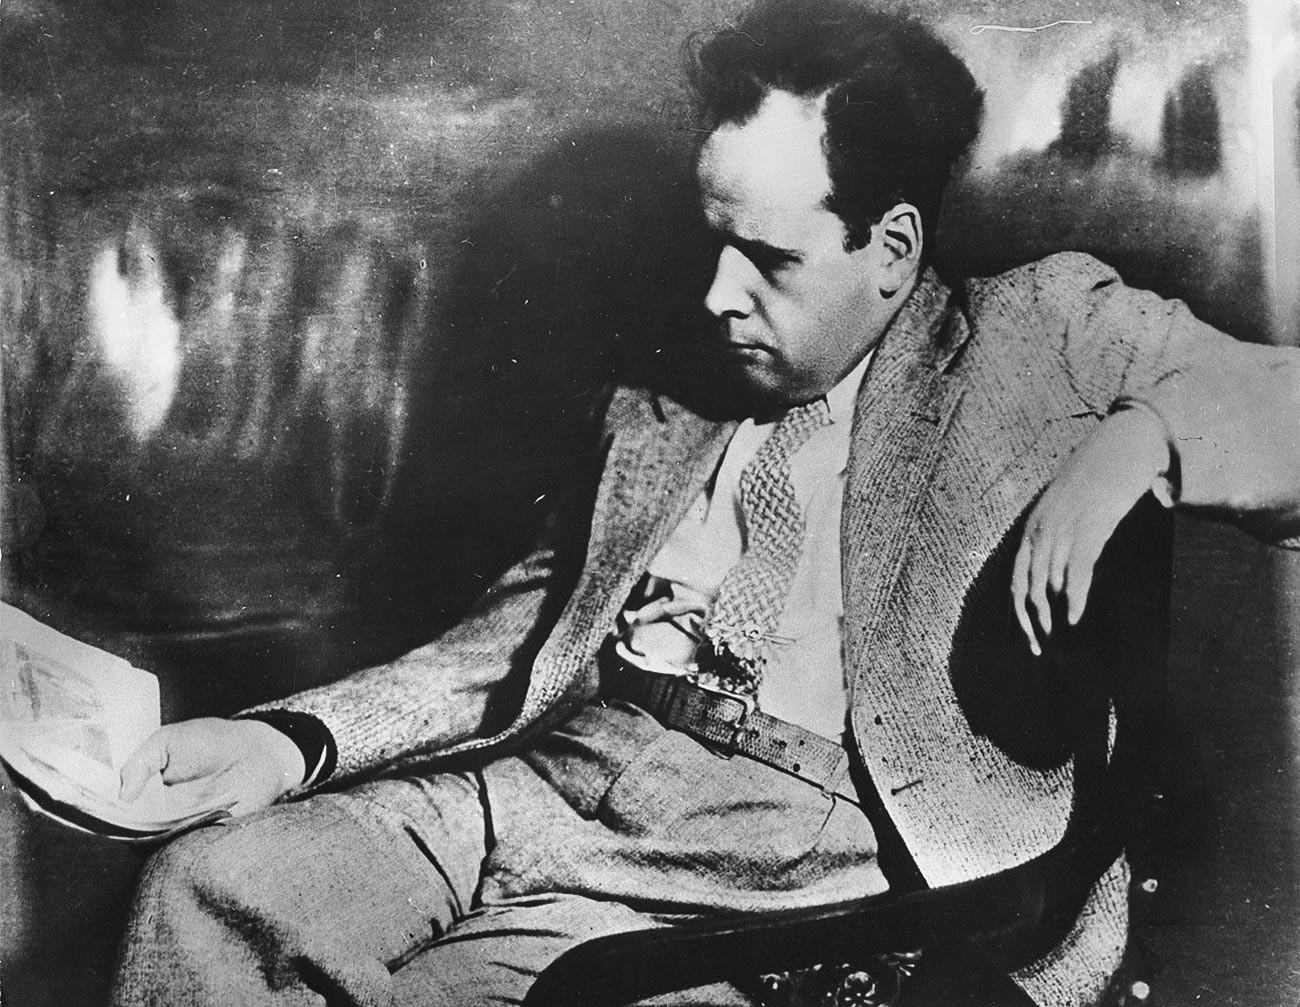 Serguéi Eisenstein, legendario director de cine soviético, años 30.